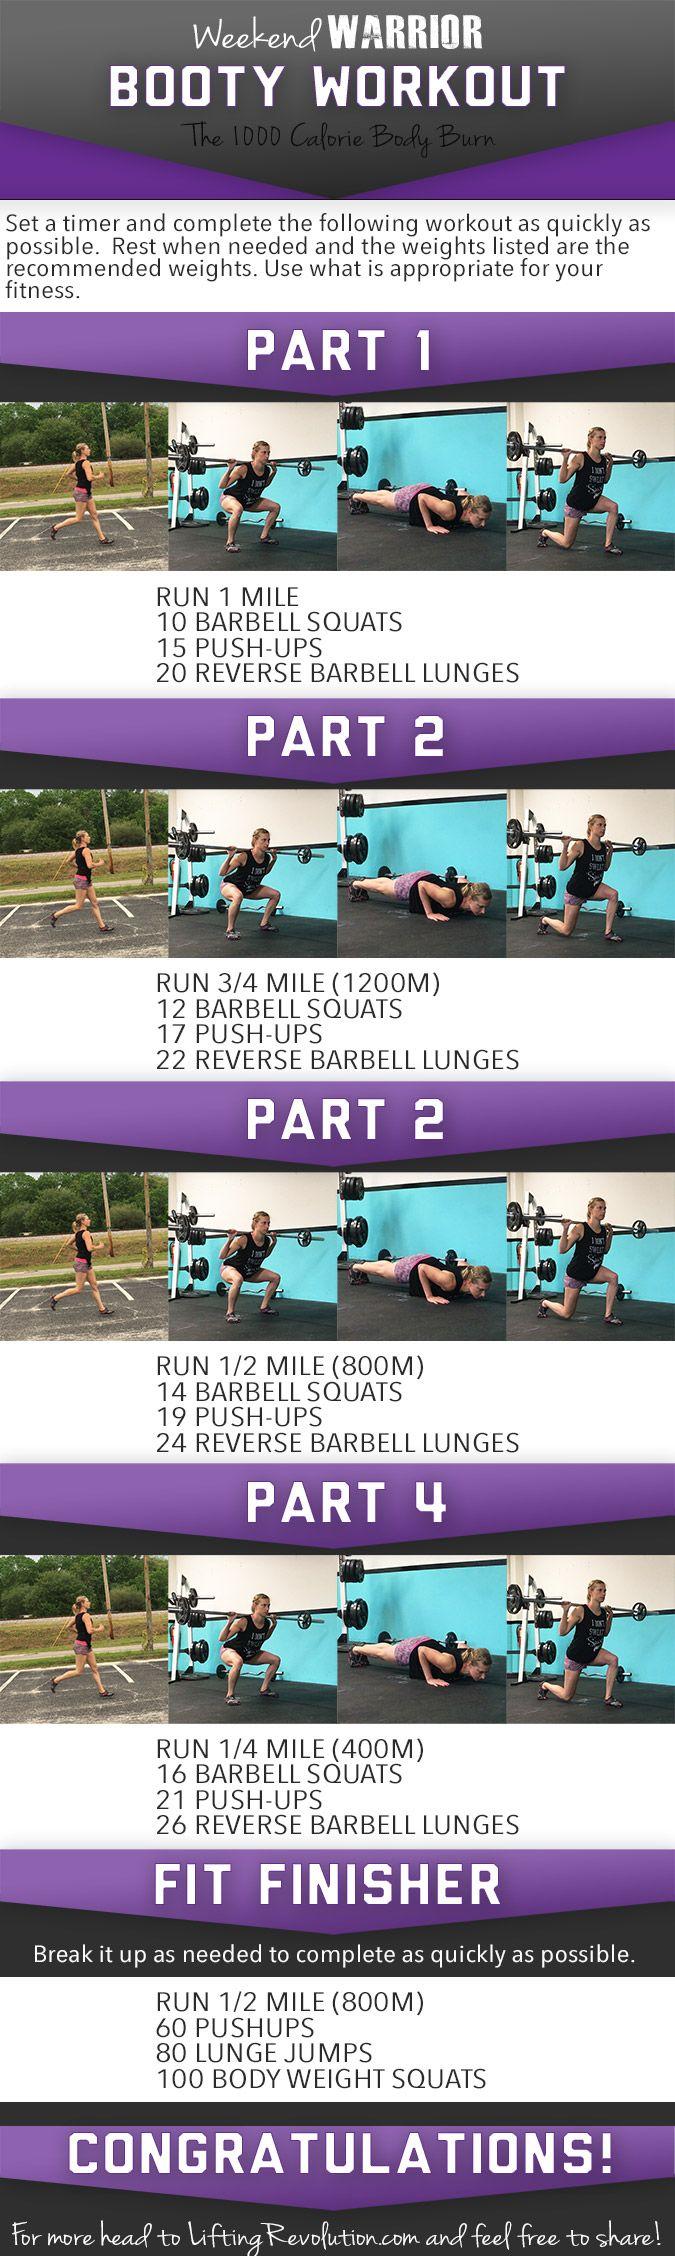 Weekend Warrior Butt Workout: Another 1000 Calorie Burning Workout #workout #barbell